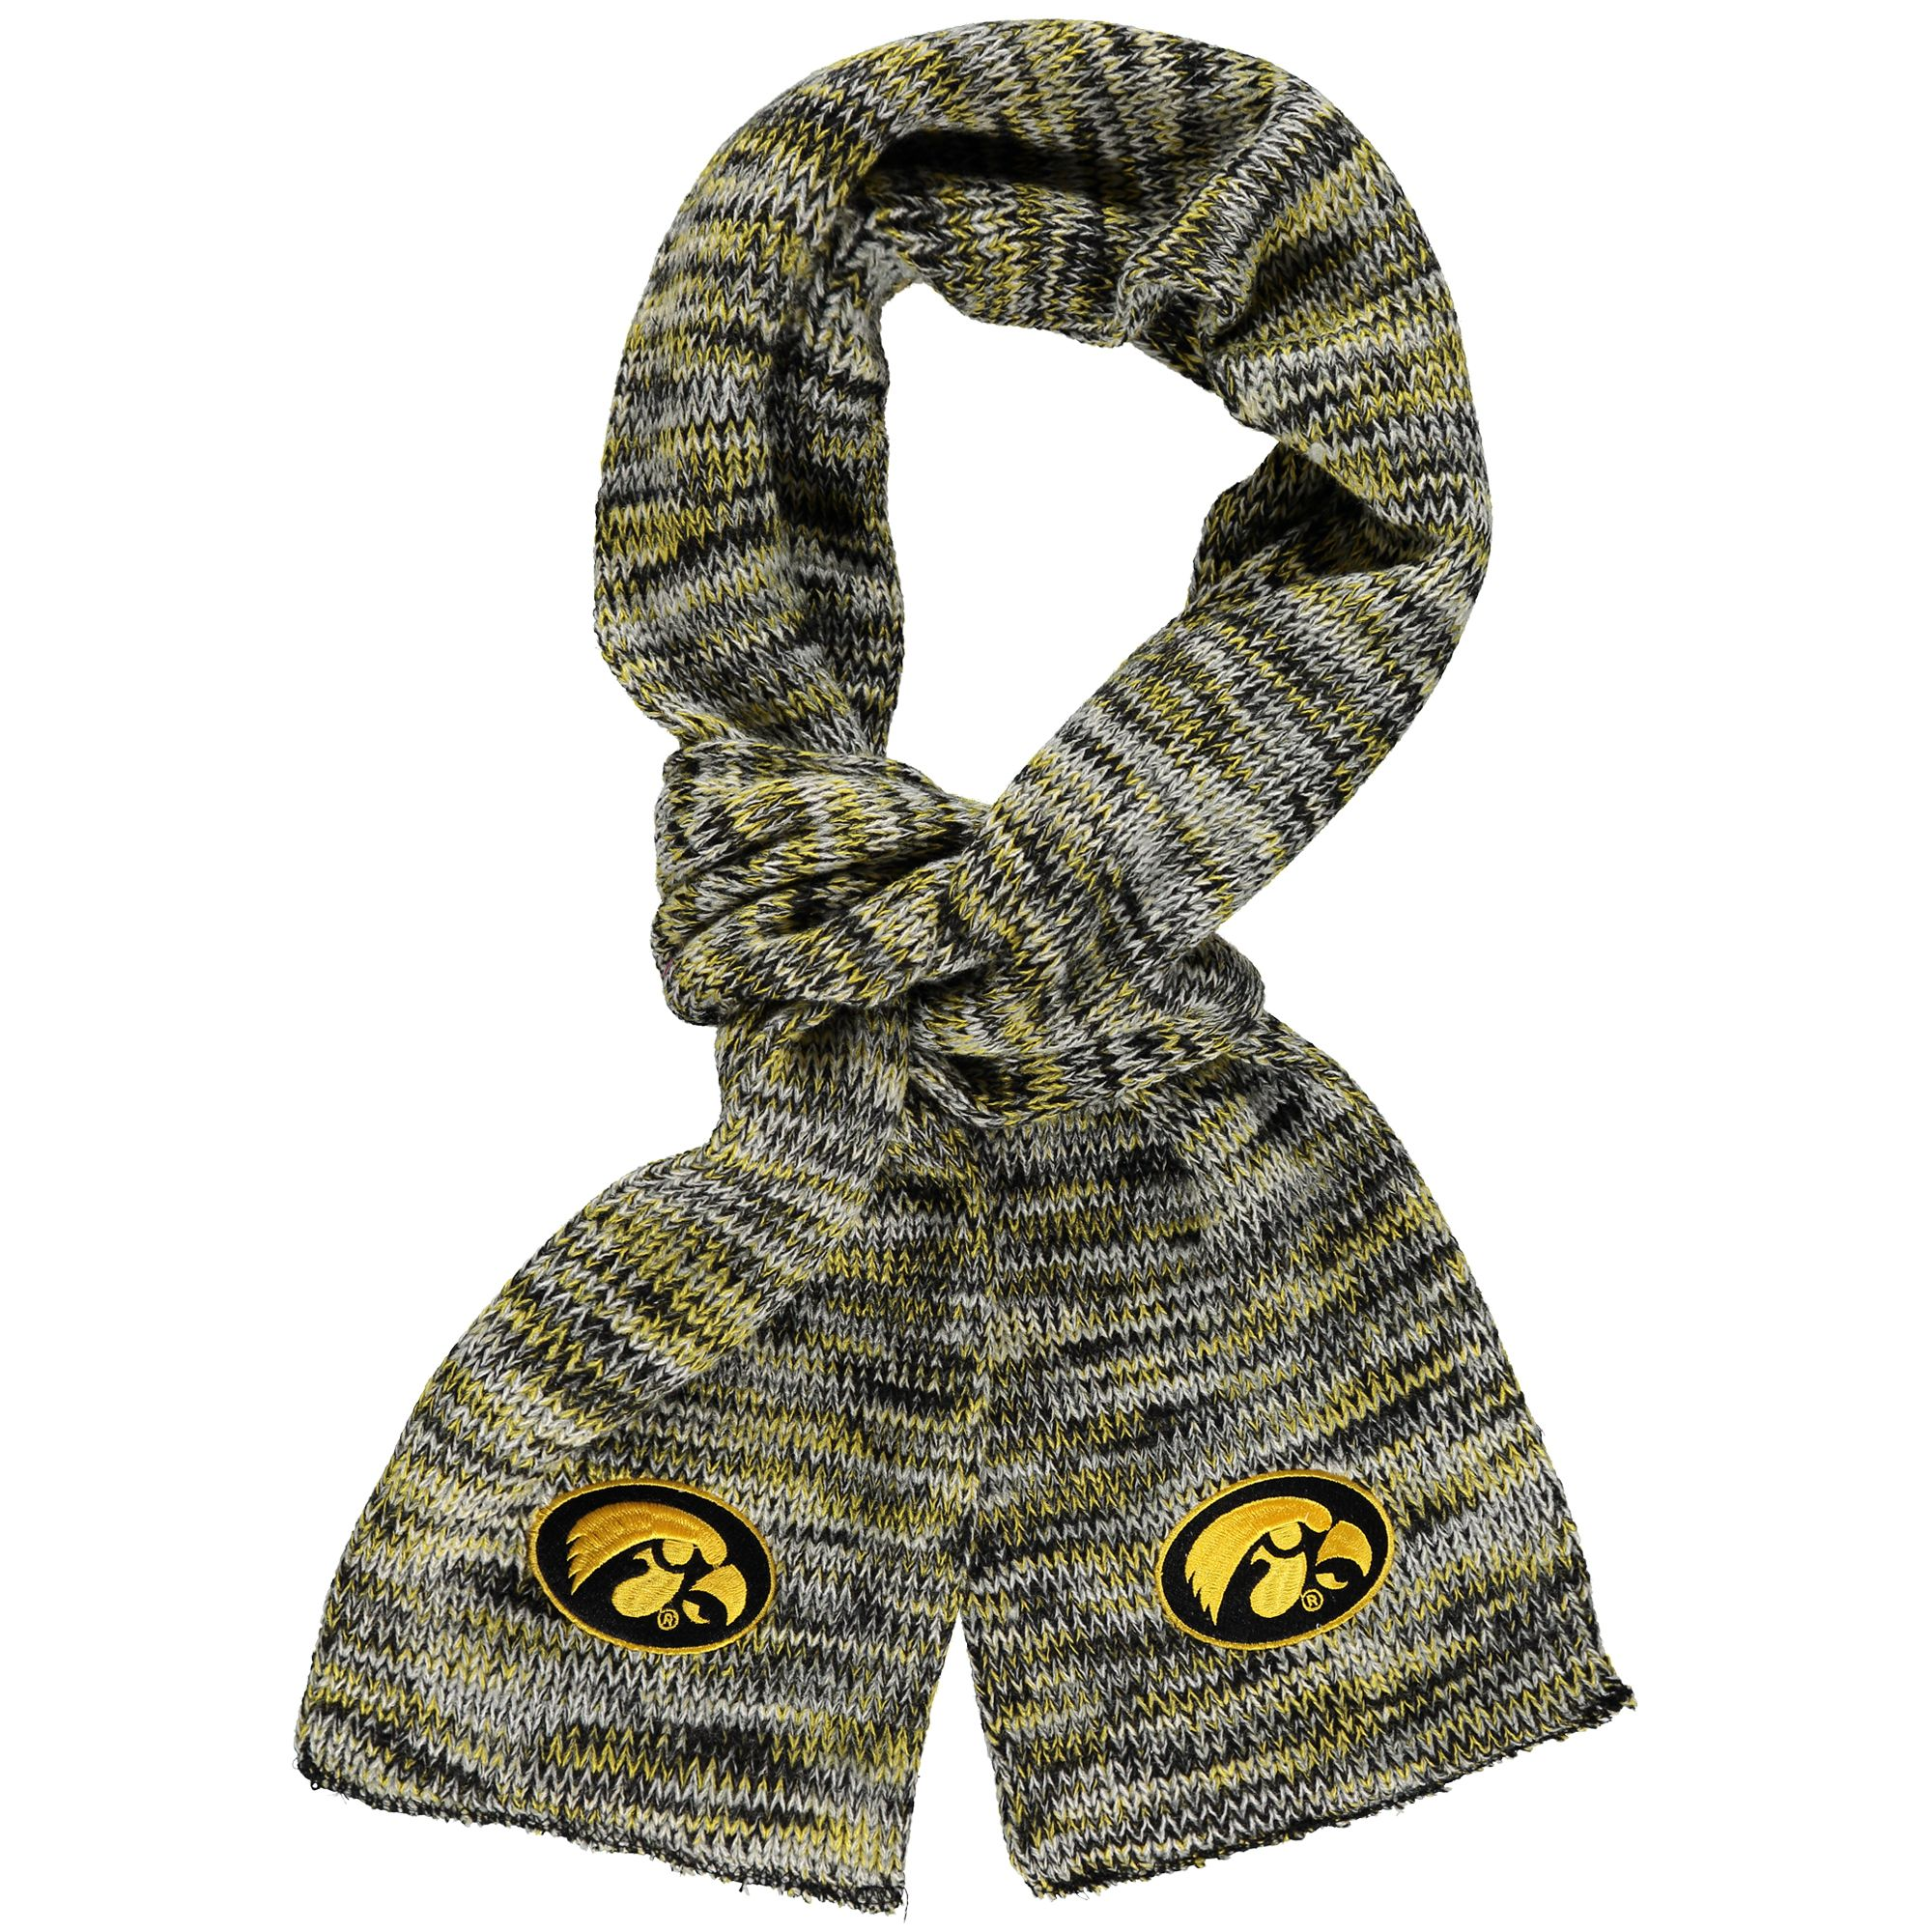 College iowa hawkeyes peak scarf with images iowa